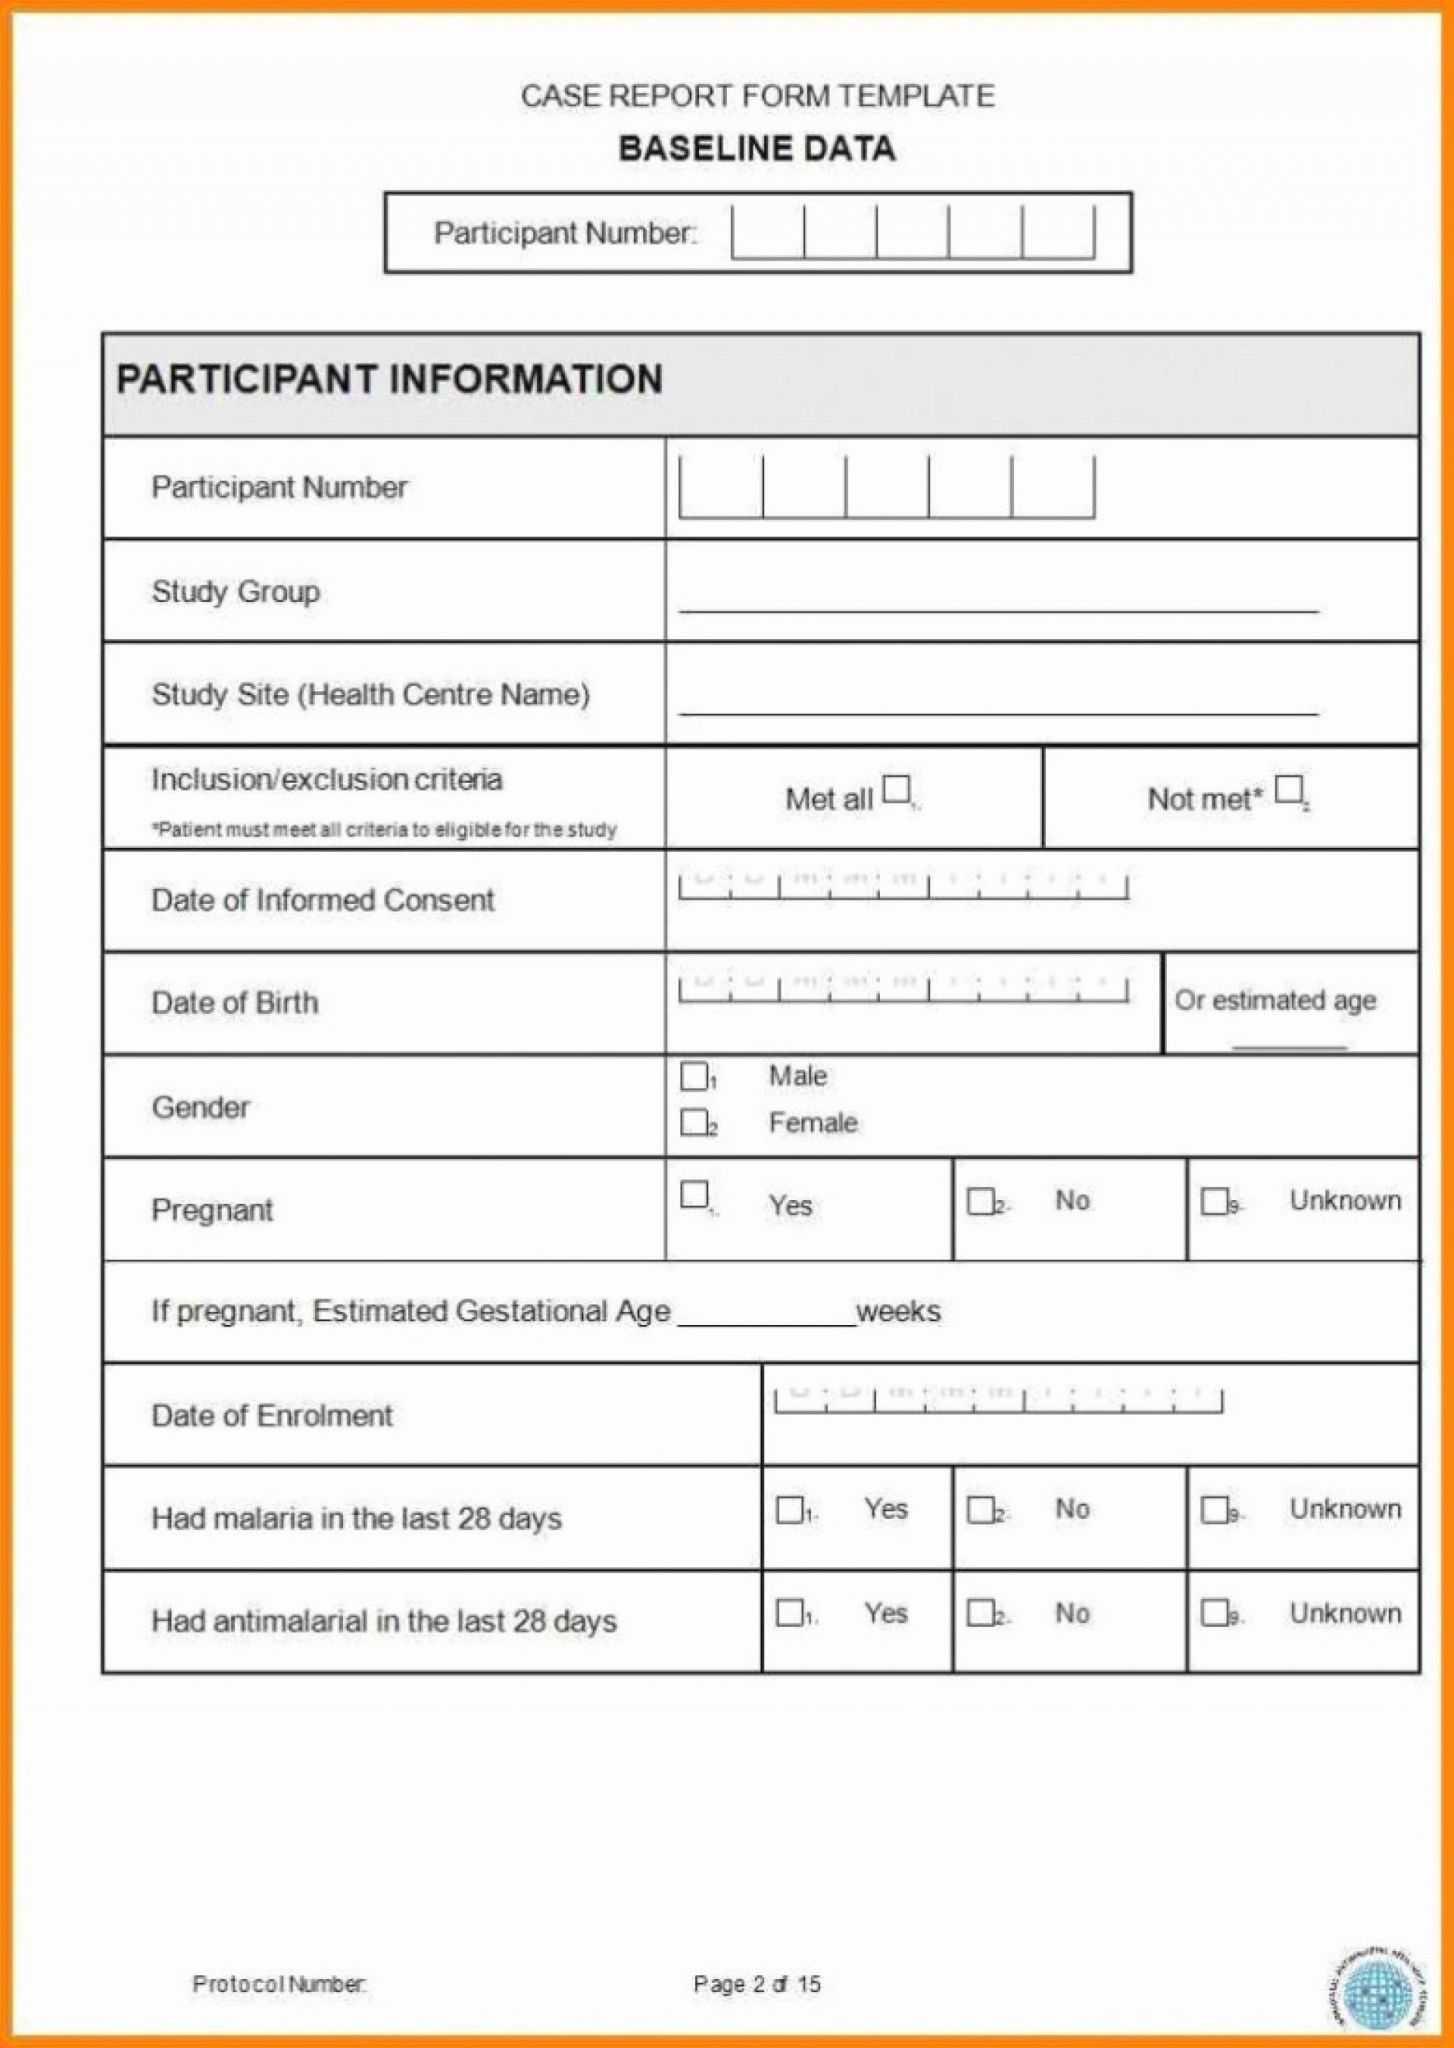 Case Report Form Template Unique Catering Resume Clinical Pertaining To Case Report Form Template